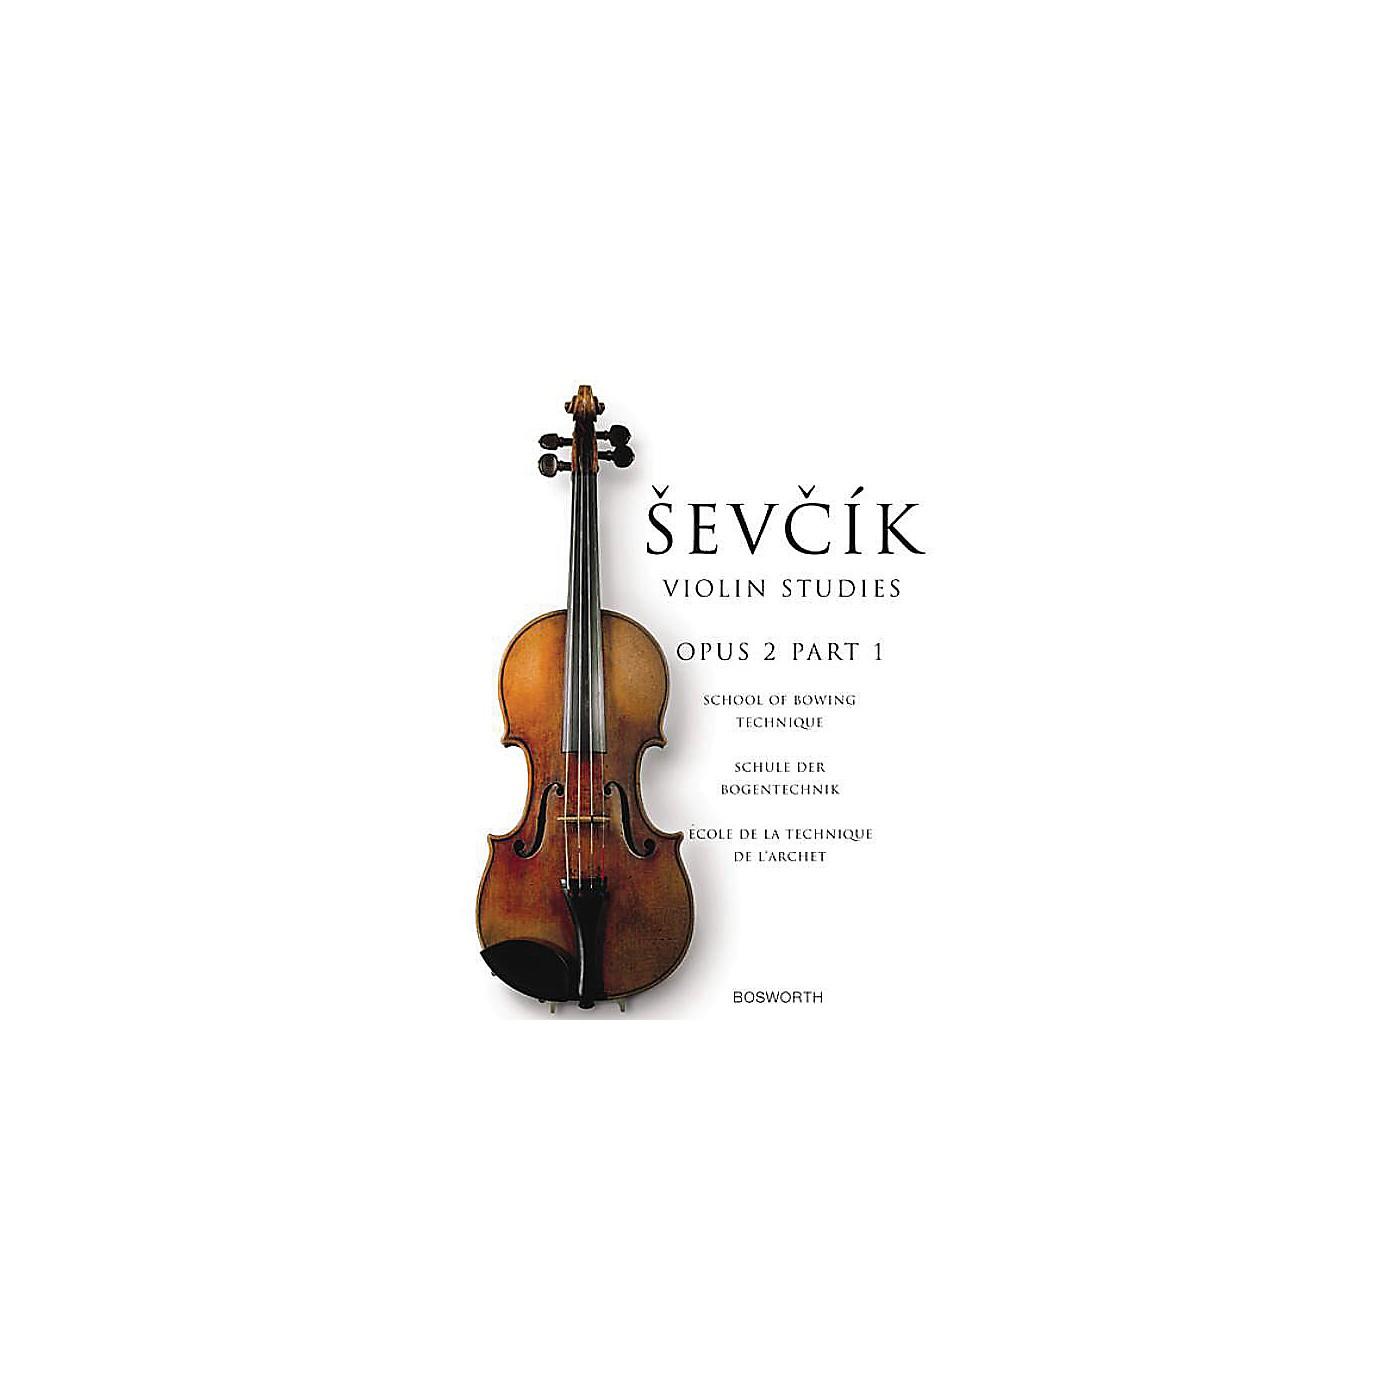 Music Sales The Original Sevcik Violin Studies: School of Bowing Technique Part 1 Music Sales America Series thumbnail